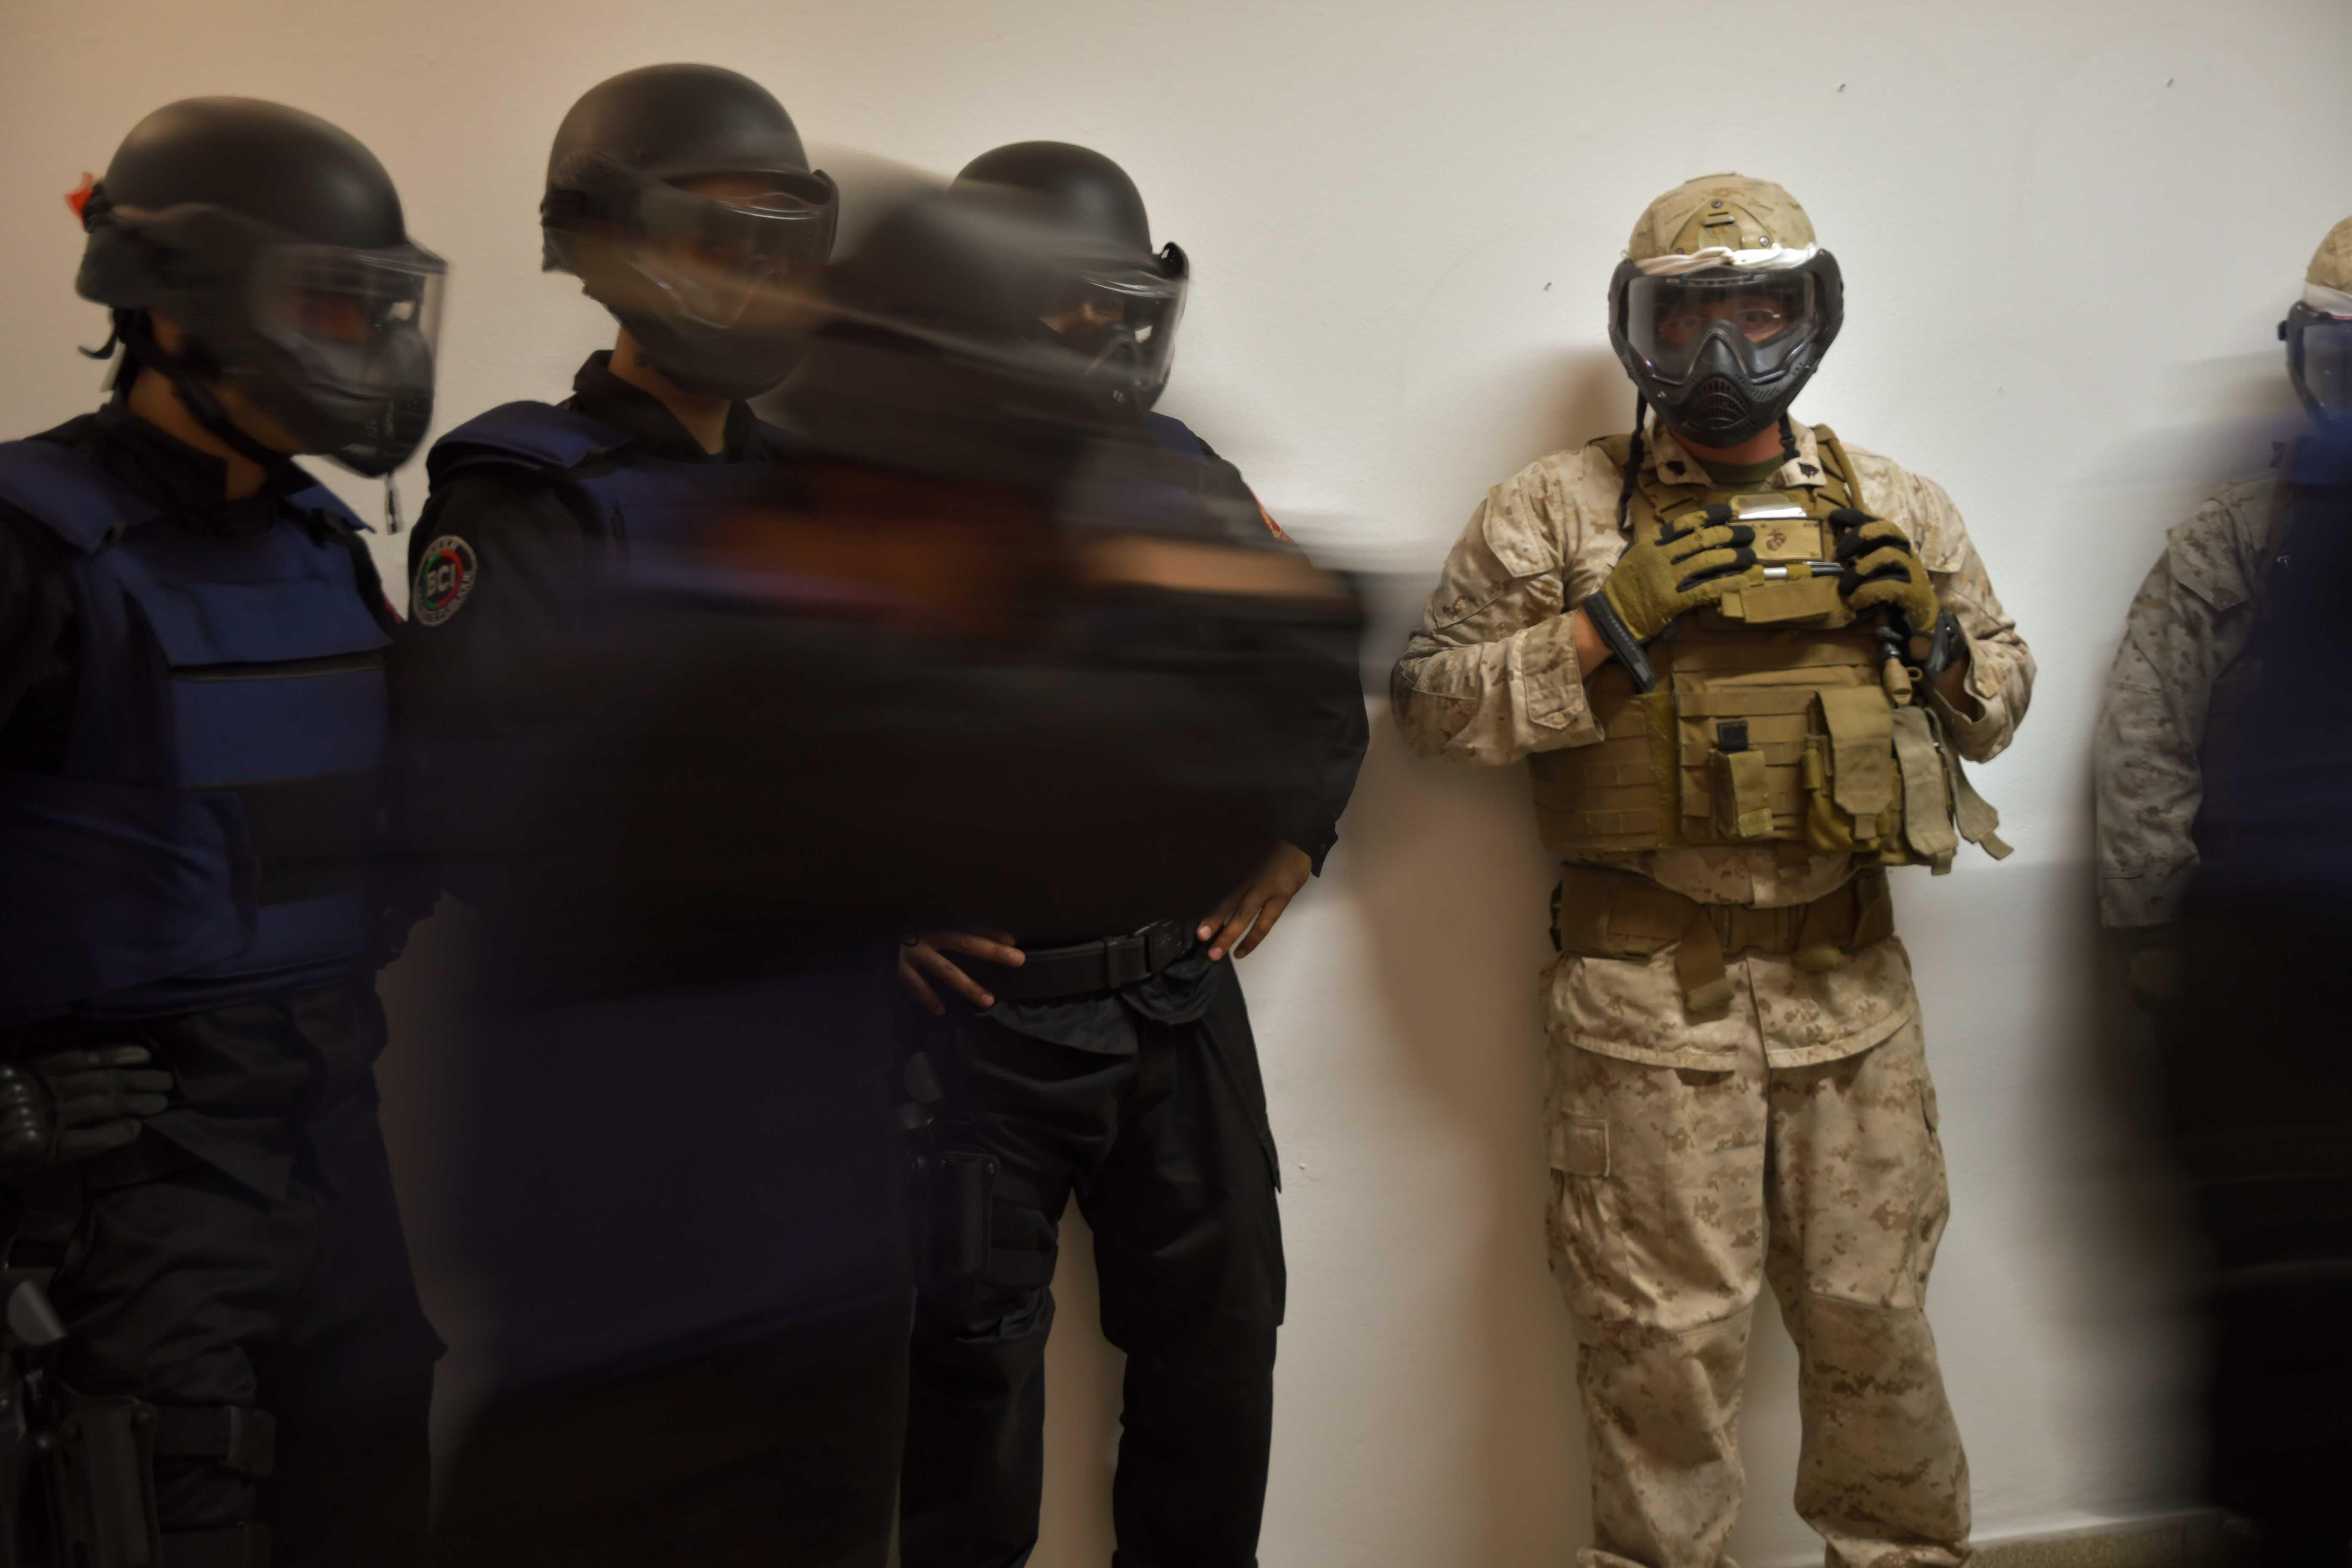 Moroccan Special Forces/Forces spéciales marocaines  :Videos et Photos : BCIJ, Gendarmerie Royale ,  - Page 11 35010133816_b36384a799_o